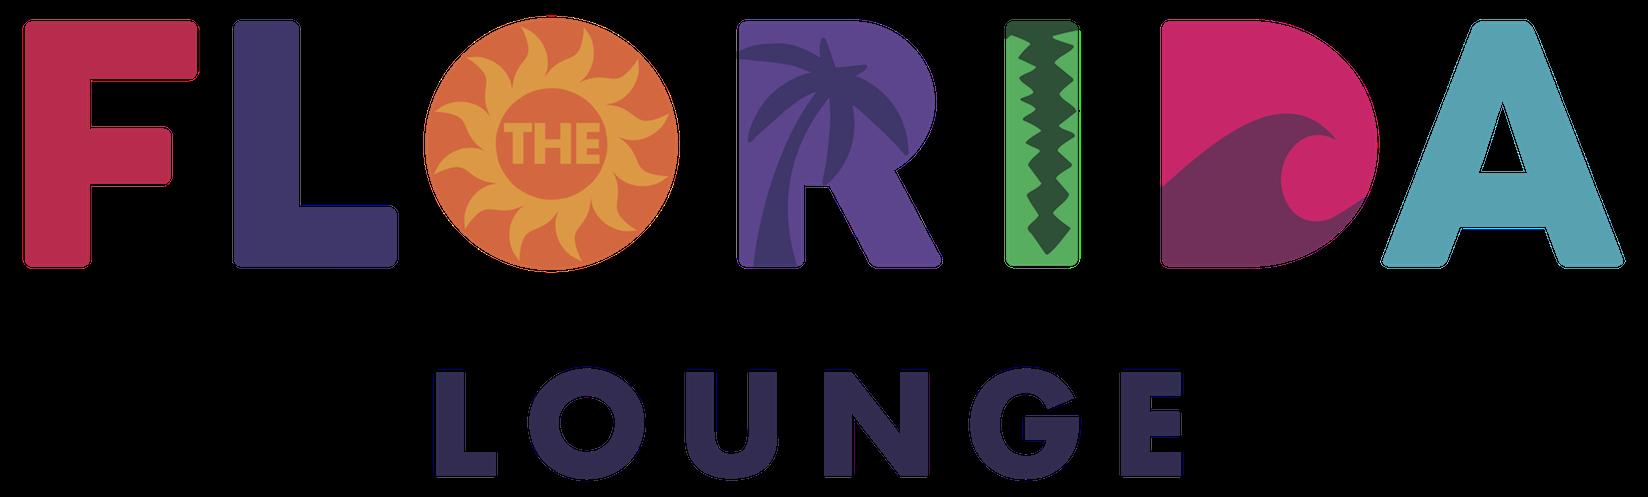 The Florida Lounge